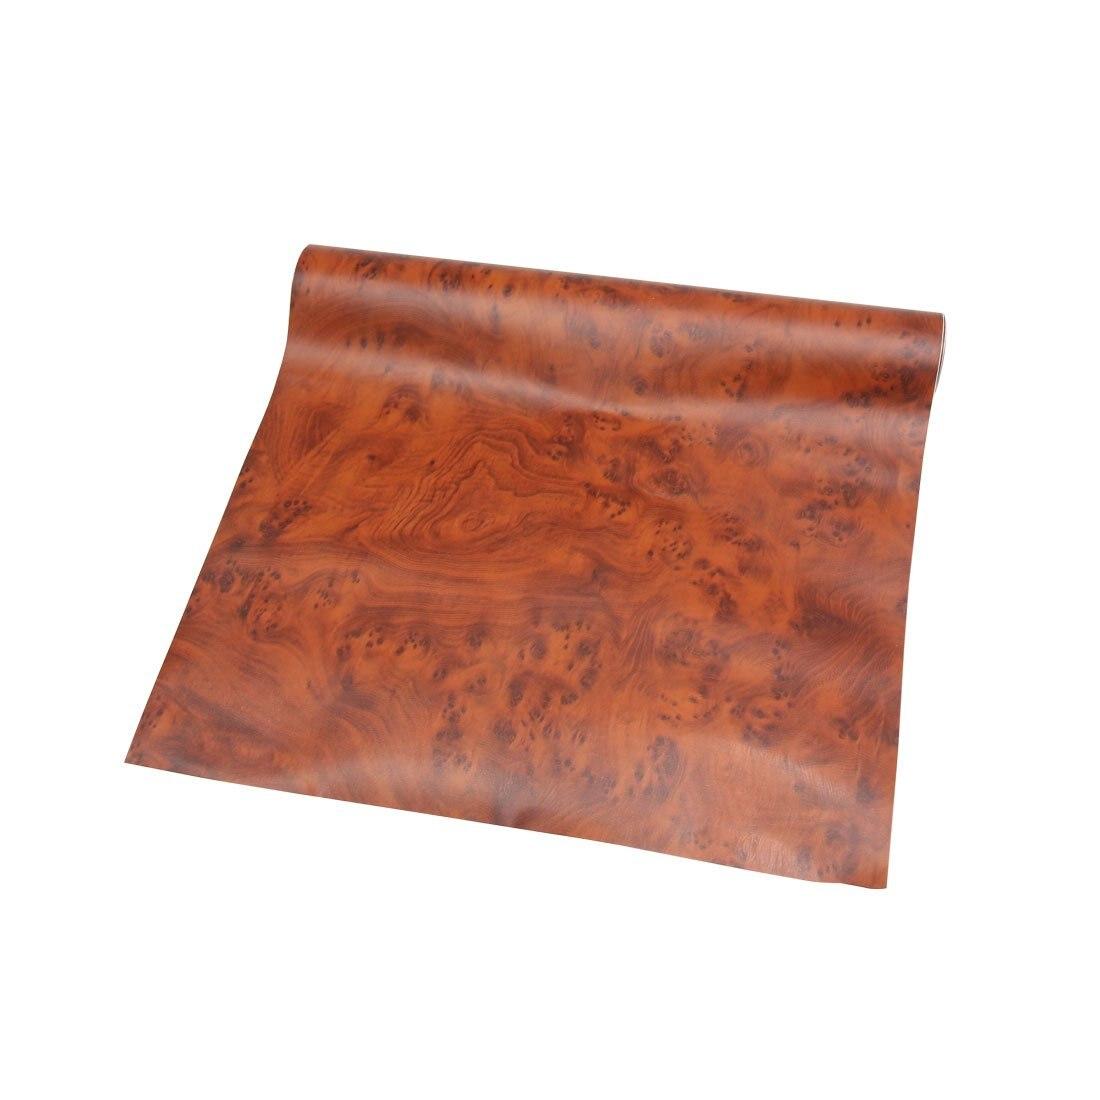 Uxcell 100x30 cm película de vinilo para coche autoadhesiva con textura de grano de madera marrón brillante